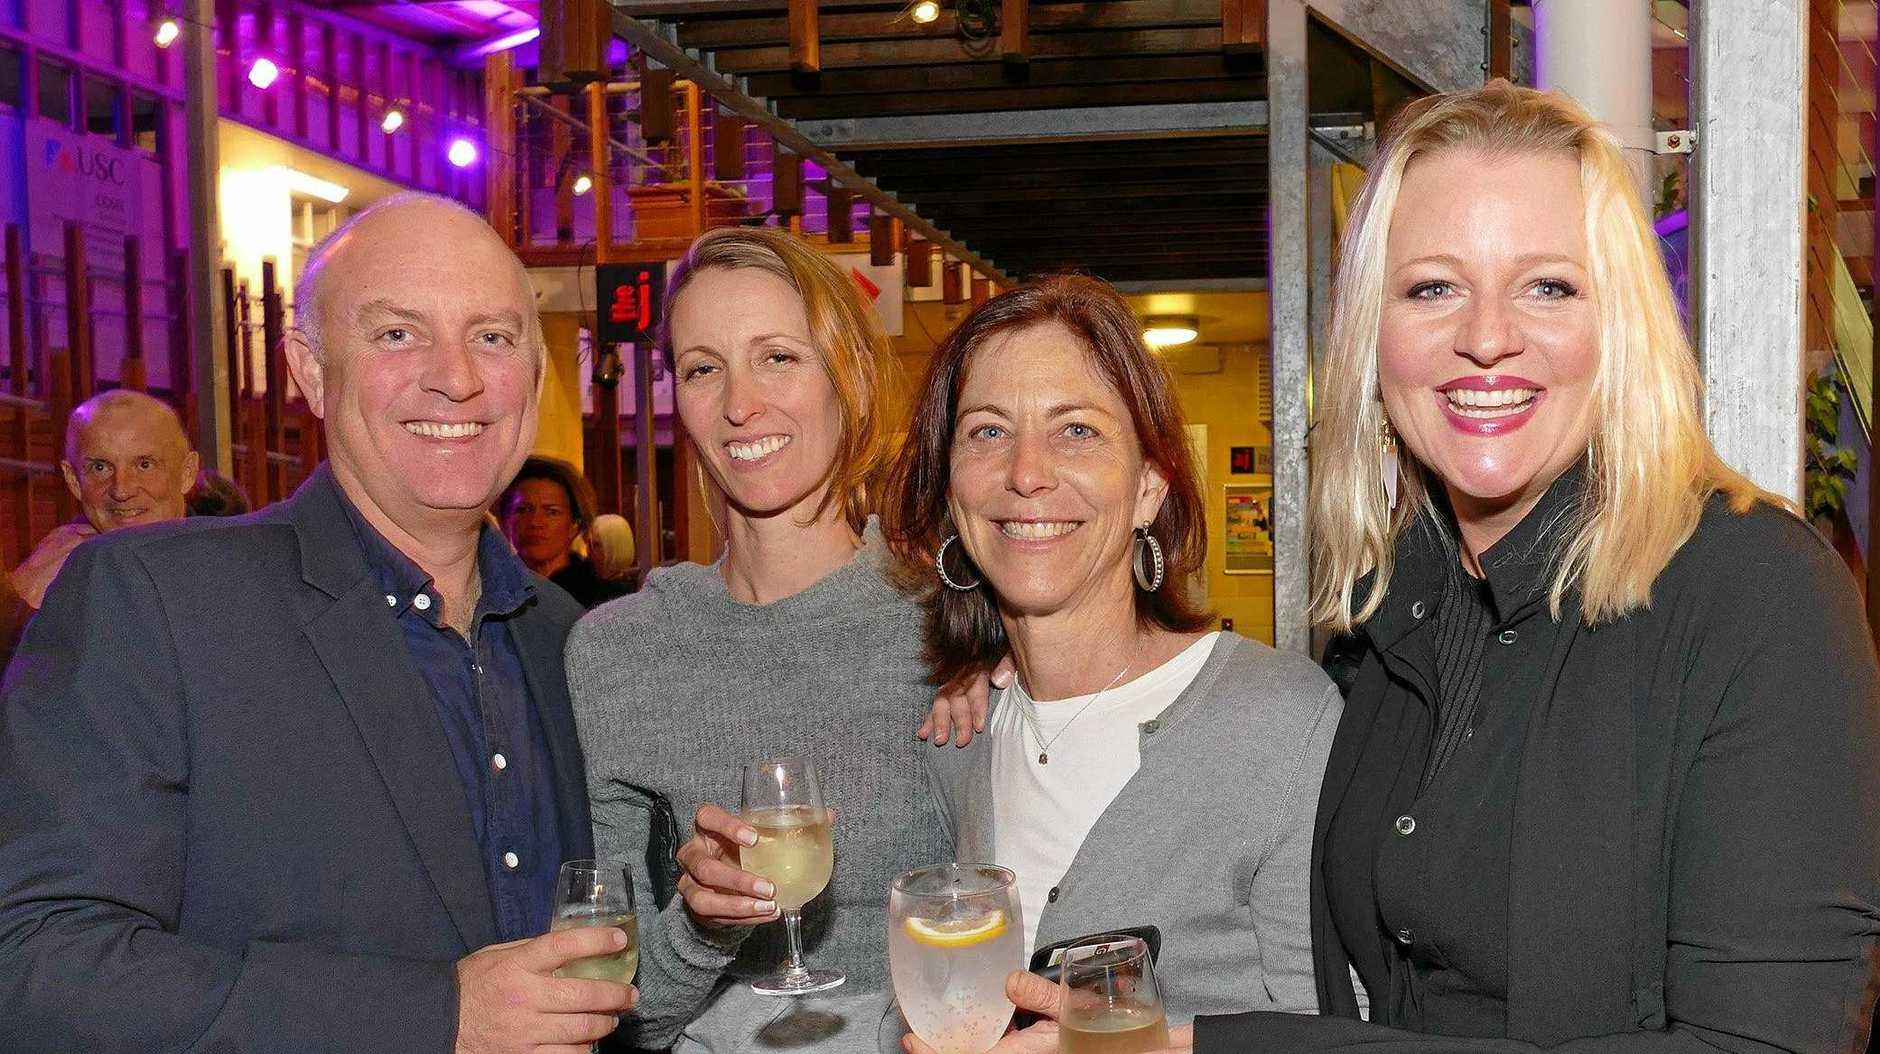 Andrew Stafford, Jade Vernon, Sheelin Coates and Renee Stafford at Noosa alive! opening night.